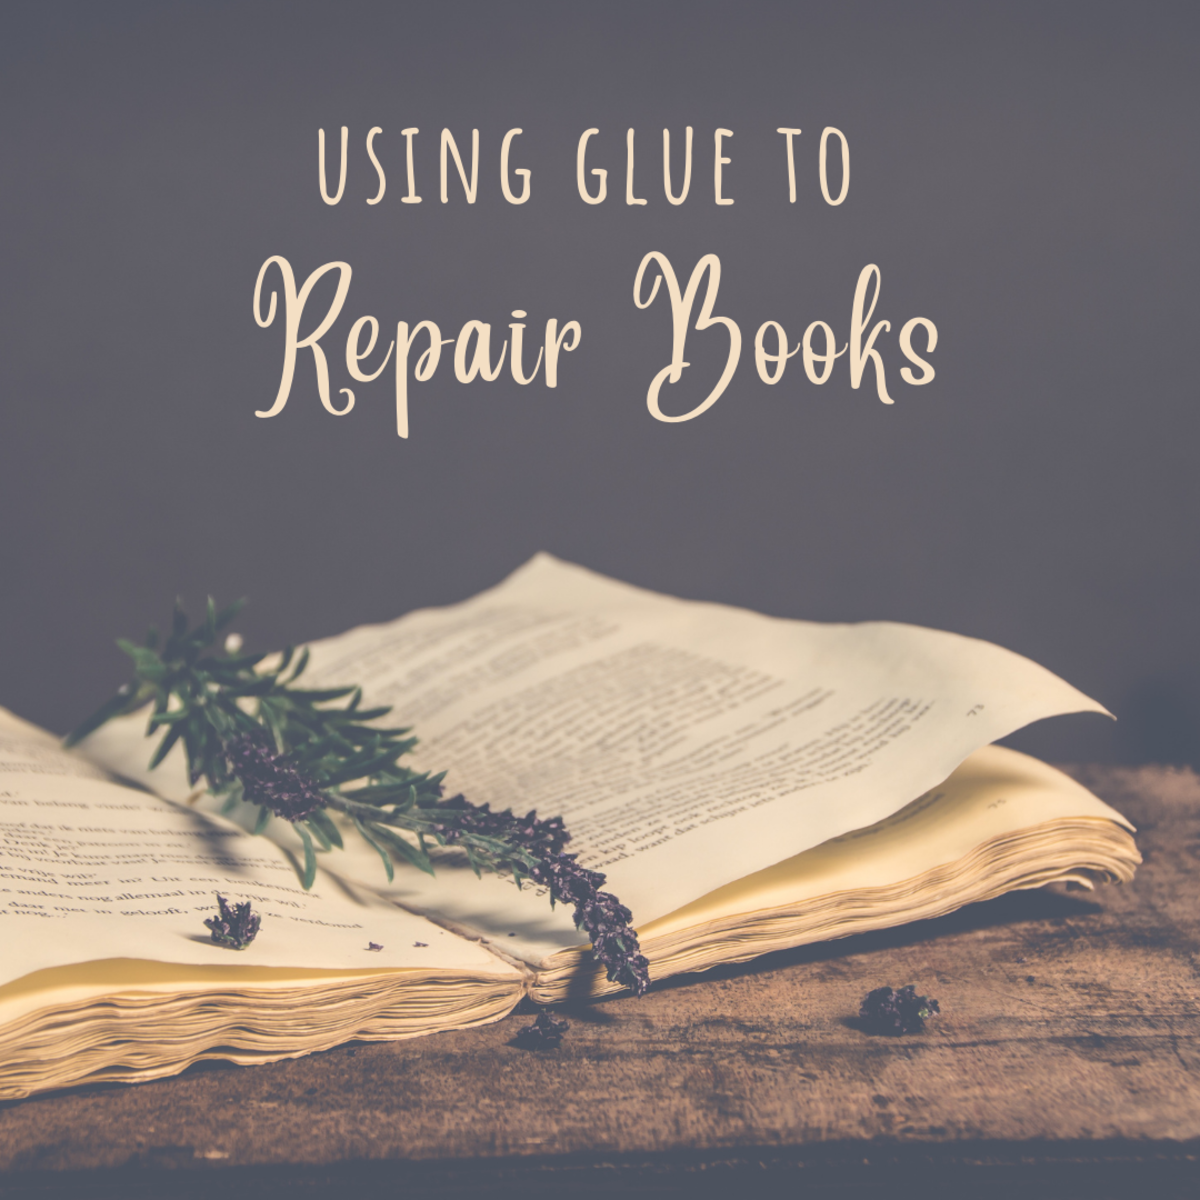 Learn how to repair glue-bound books.